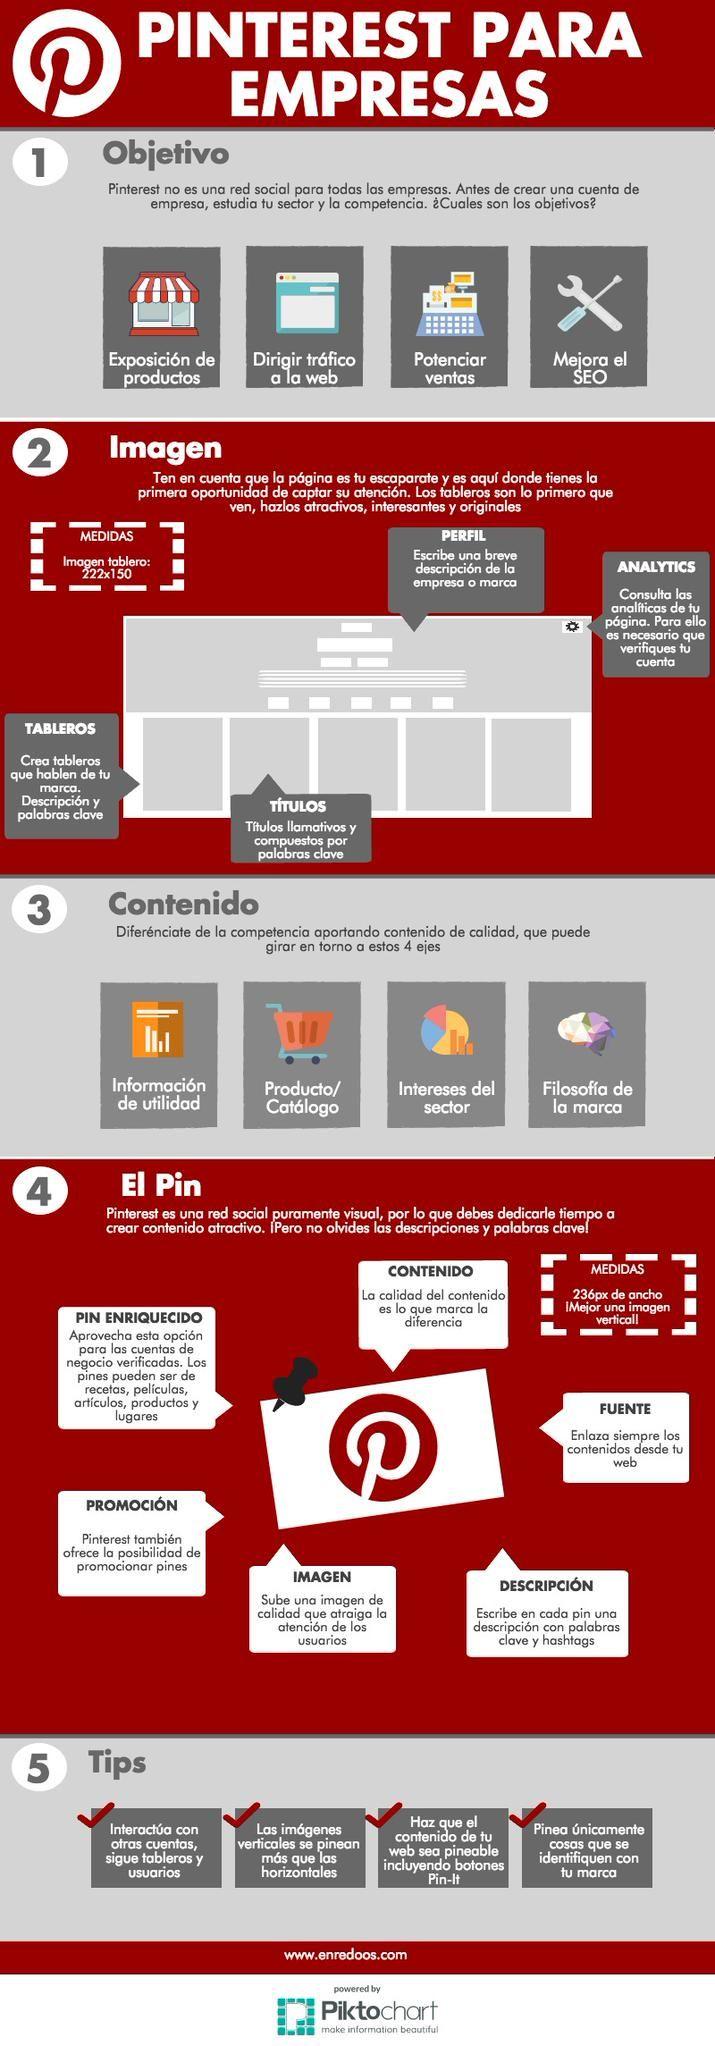 Infografía: Pinterest para empresas vía @EnredoosSM #infografia #pinterest…